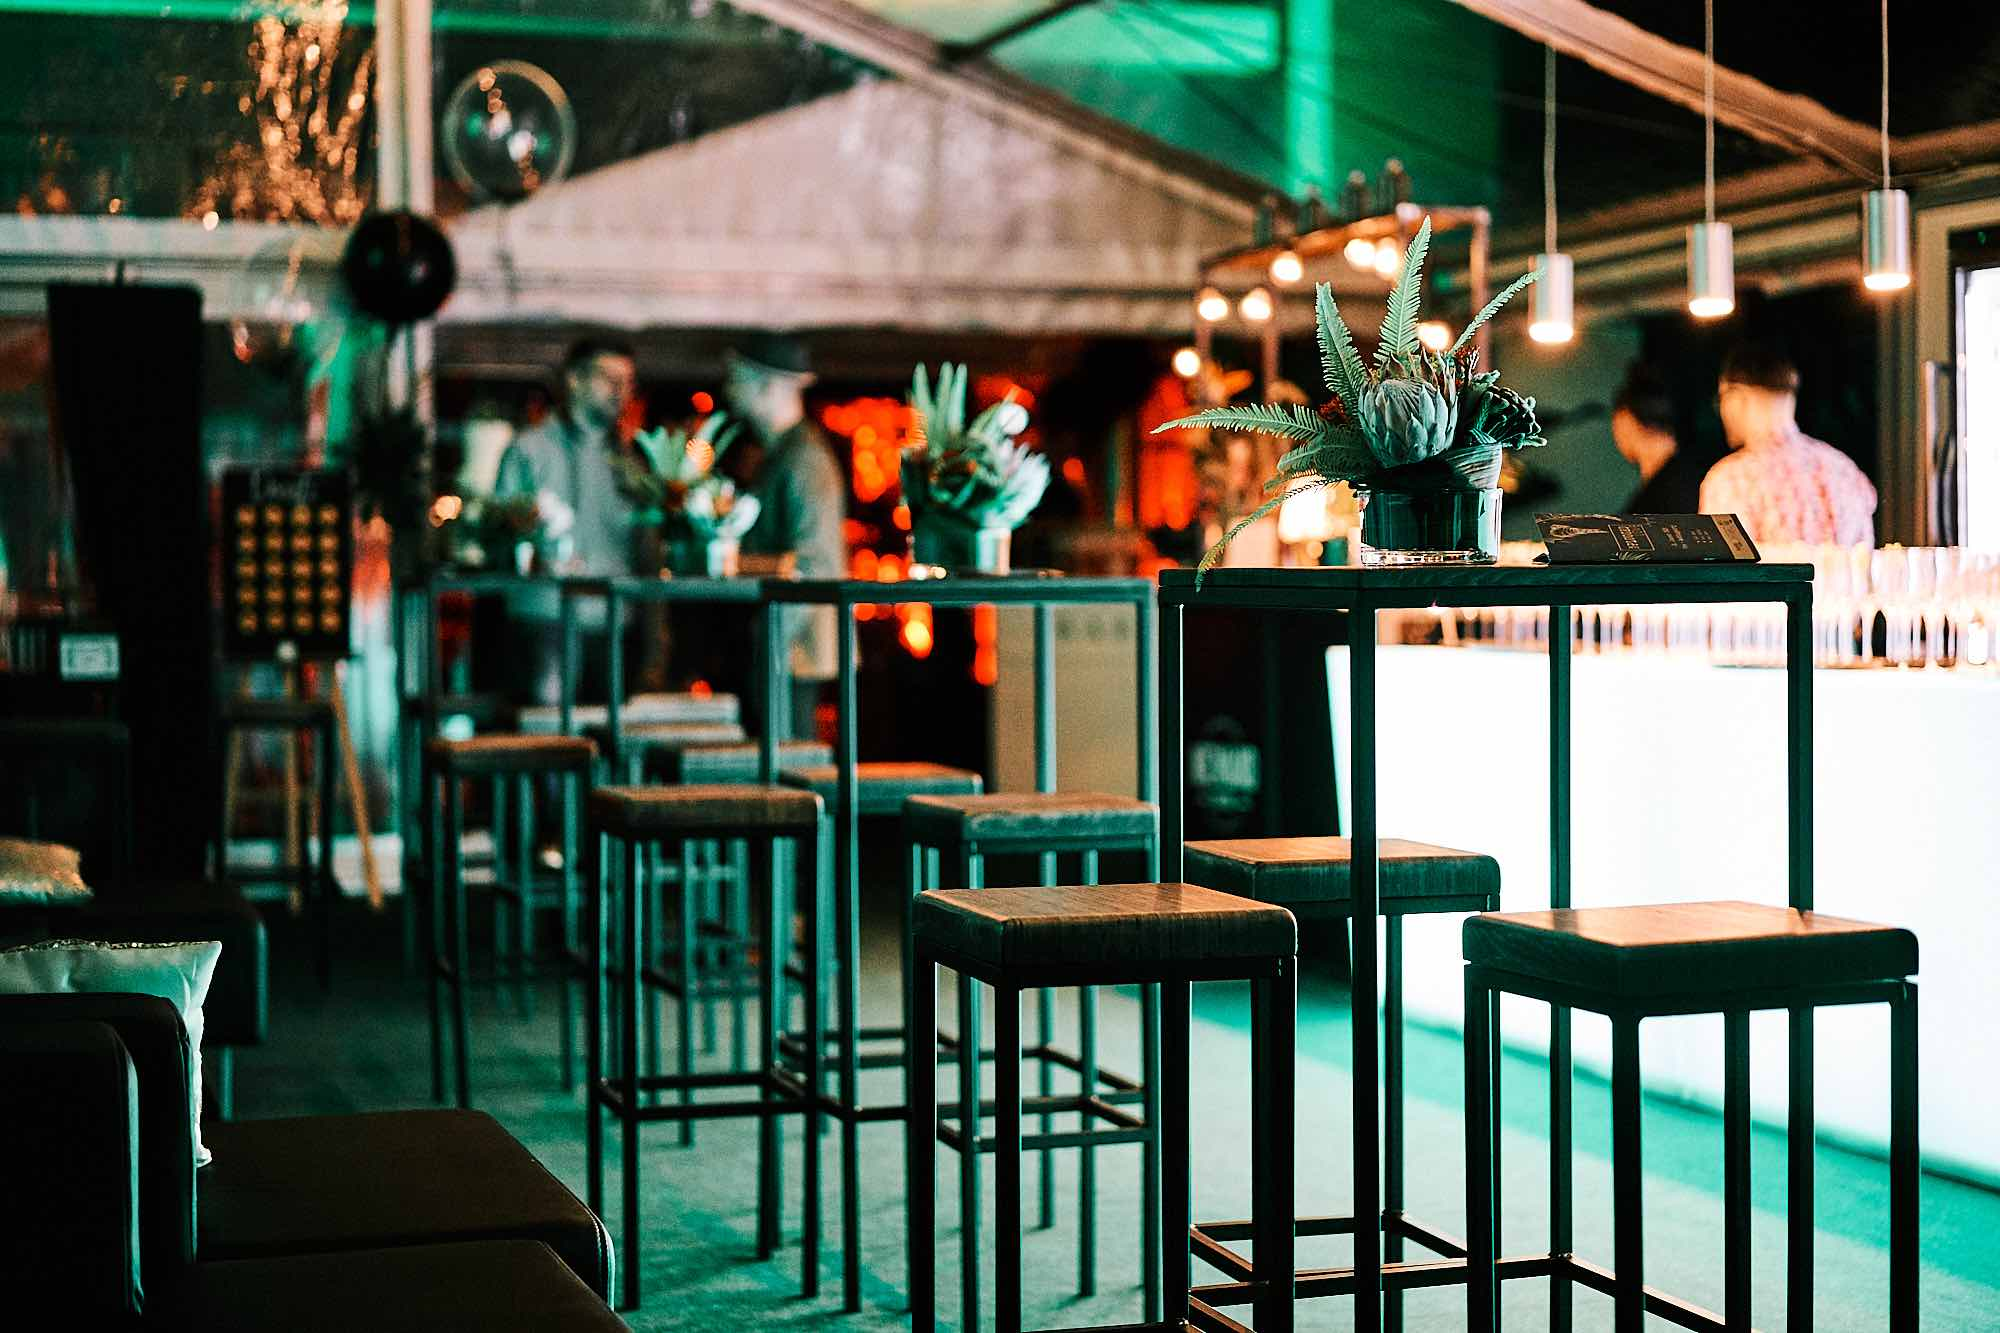 Eventplanung | Eventausstatung | Event | Miet | Service | Hannover | Kongresse | Shows | Galas Modenschauen | Bühnen | Lichttechnik | Tontechnik | Logistik | Dekoration | Catering | Programmgestaltung | Künstler